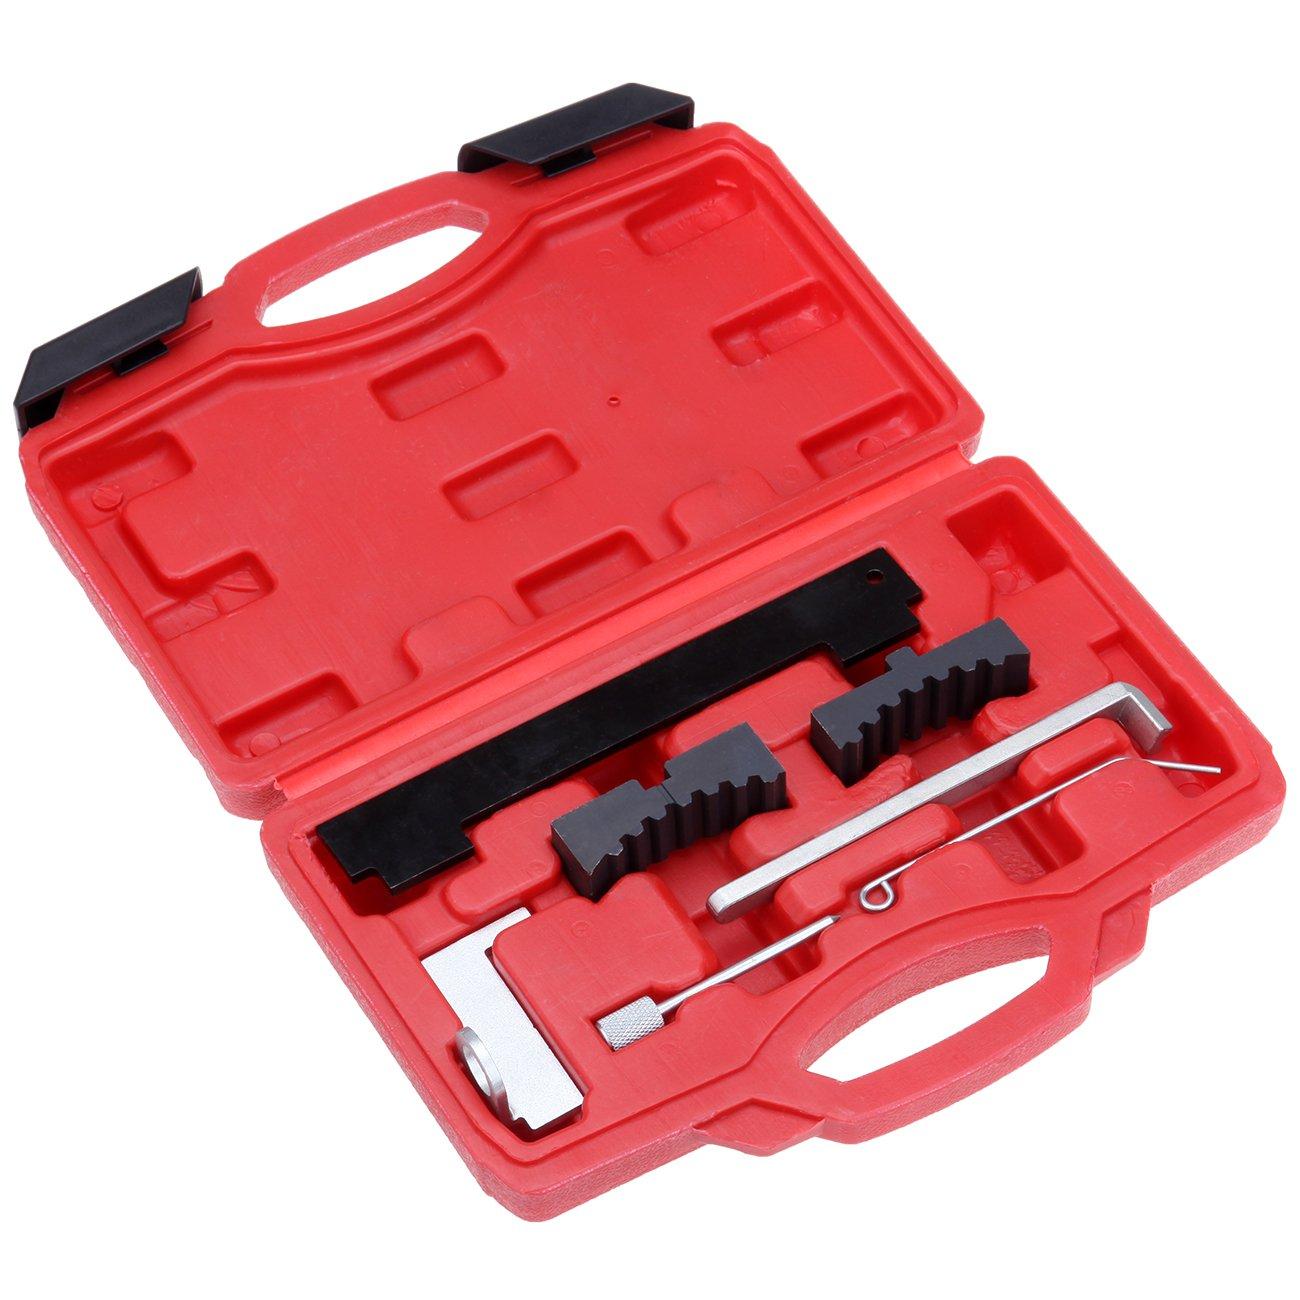 Amazon.com: Iglobalbuy 7PC Engine Timing Locking Tool Kit For ALFA FIAT GM OPEL VAUXHALL 1.4 1.6 16V: Automotive